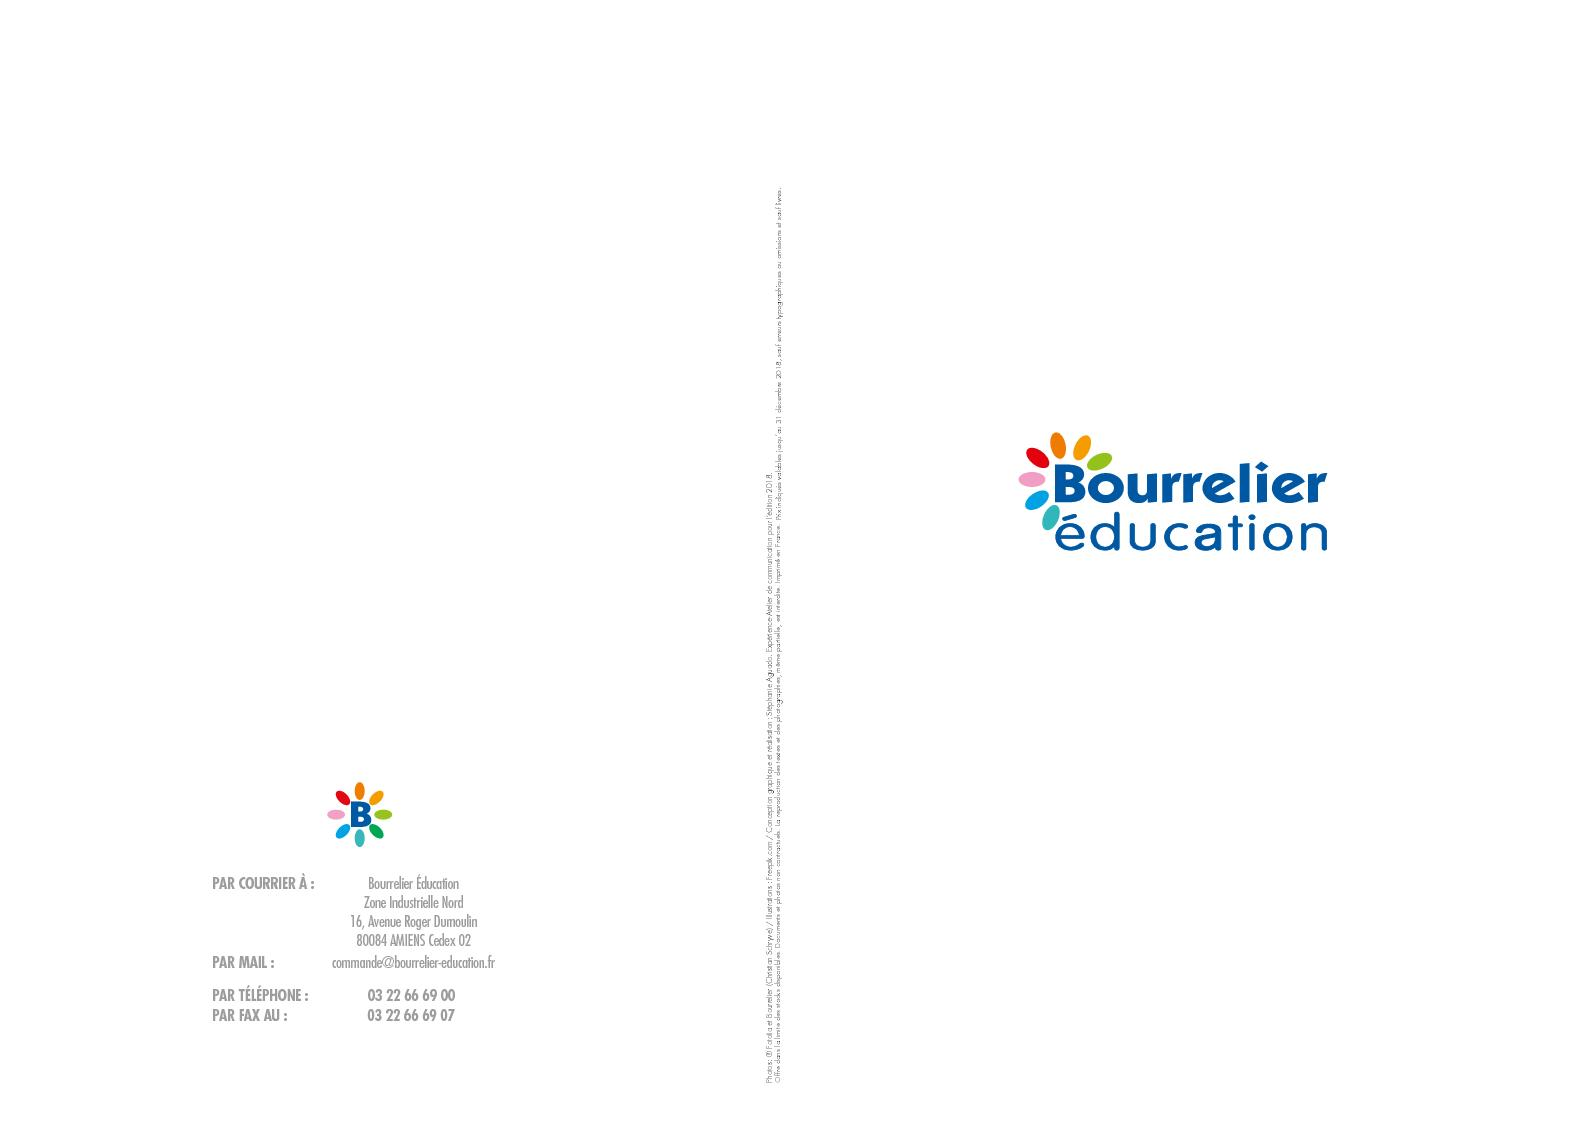 Calaméo - Catalogue Bourrelier Education 3 6 Ans 2018 2 223 6eca2f1b958